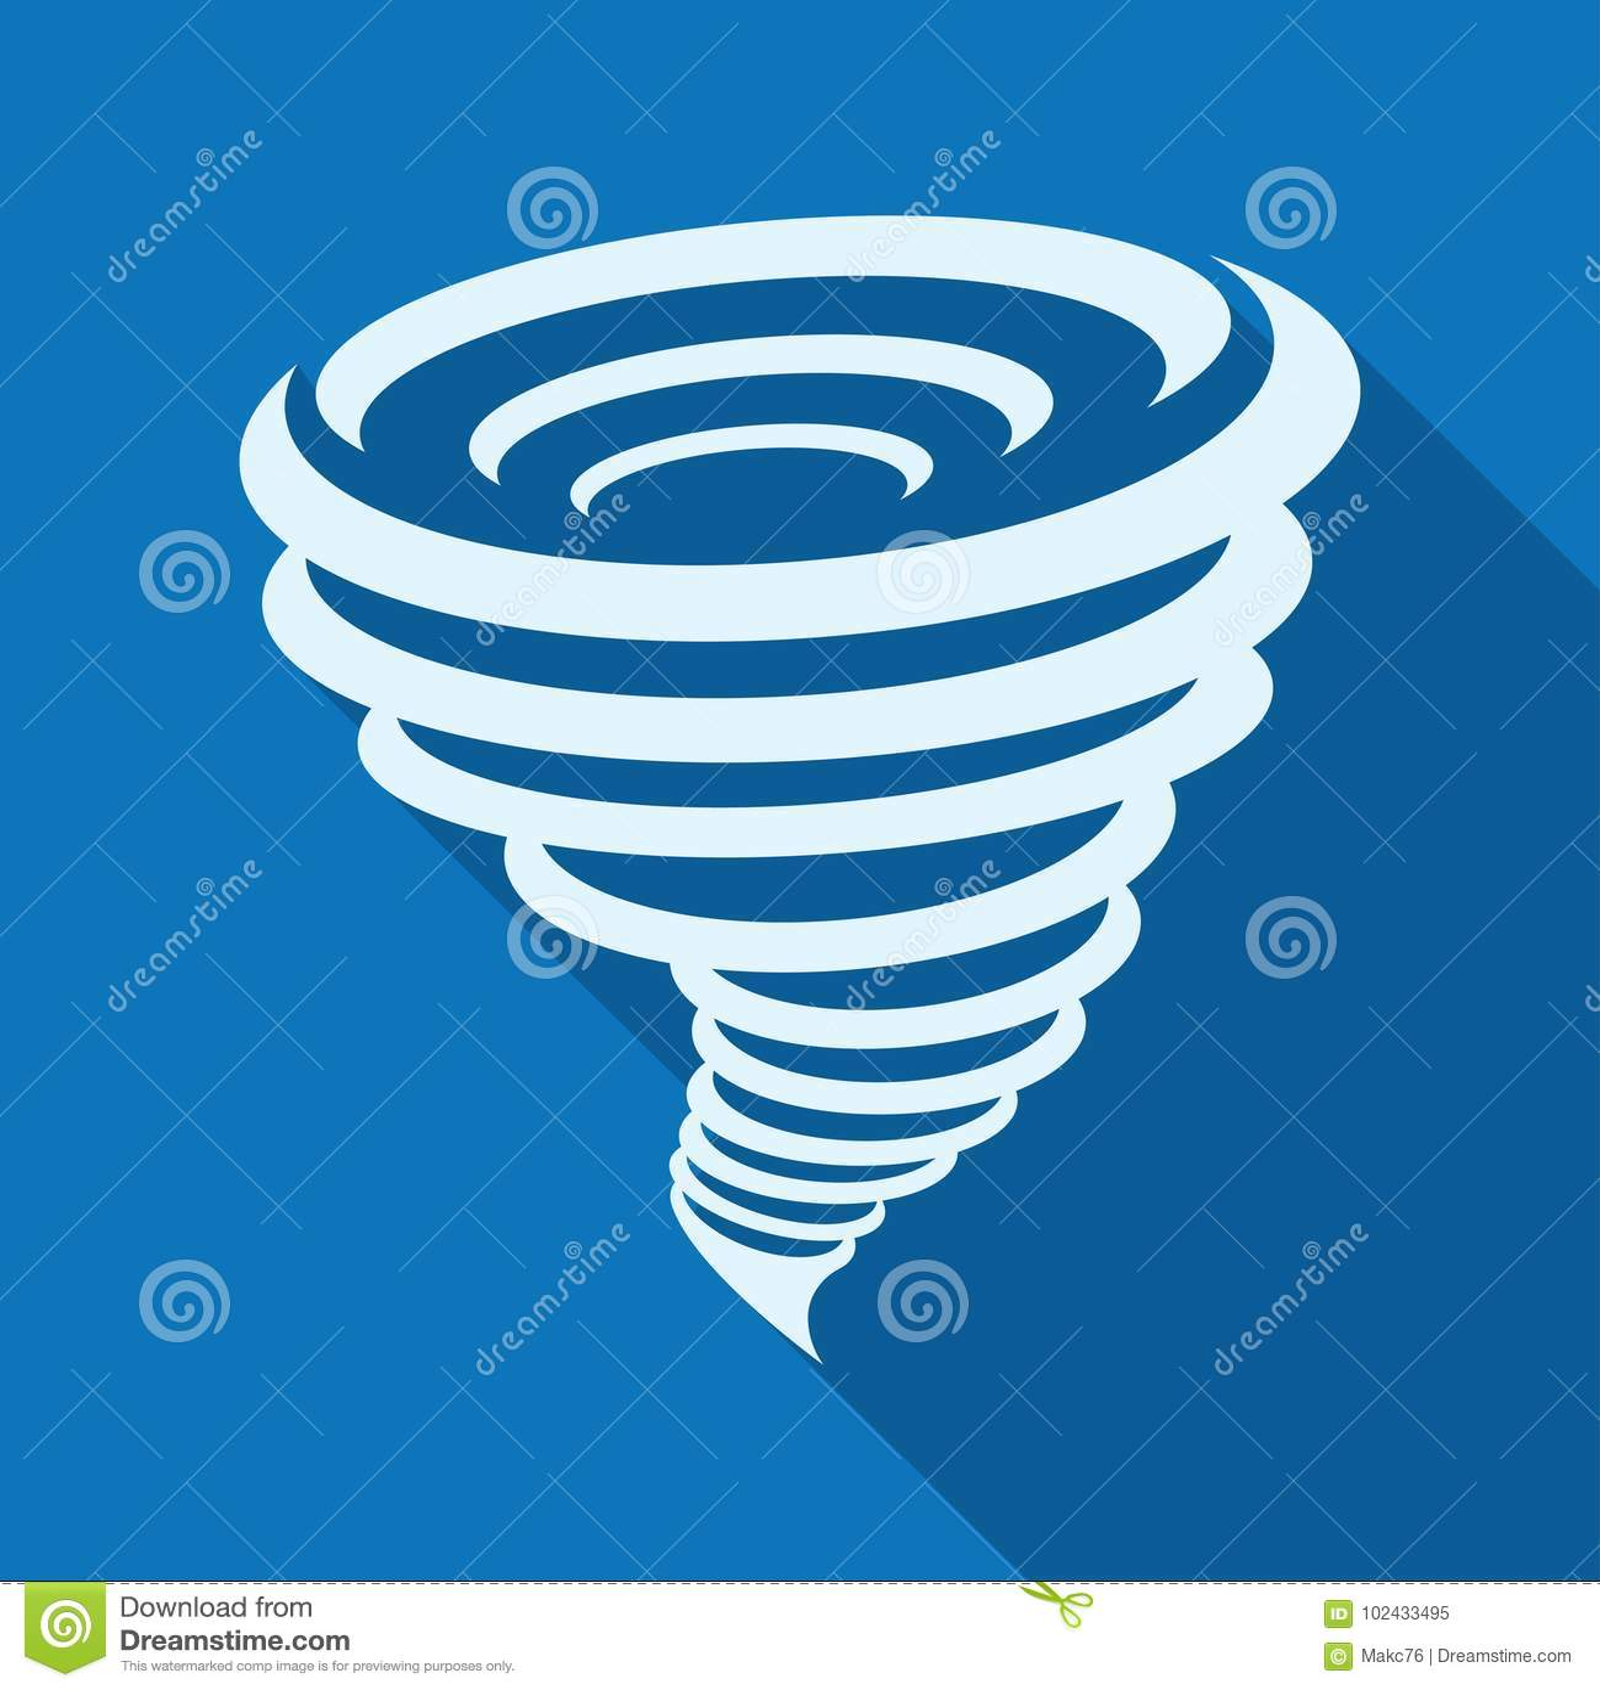 Icône de tornade, illustration de vecteur